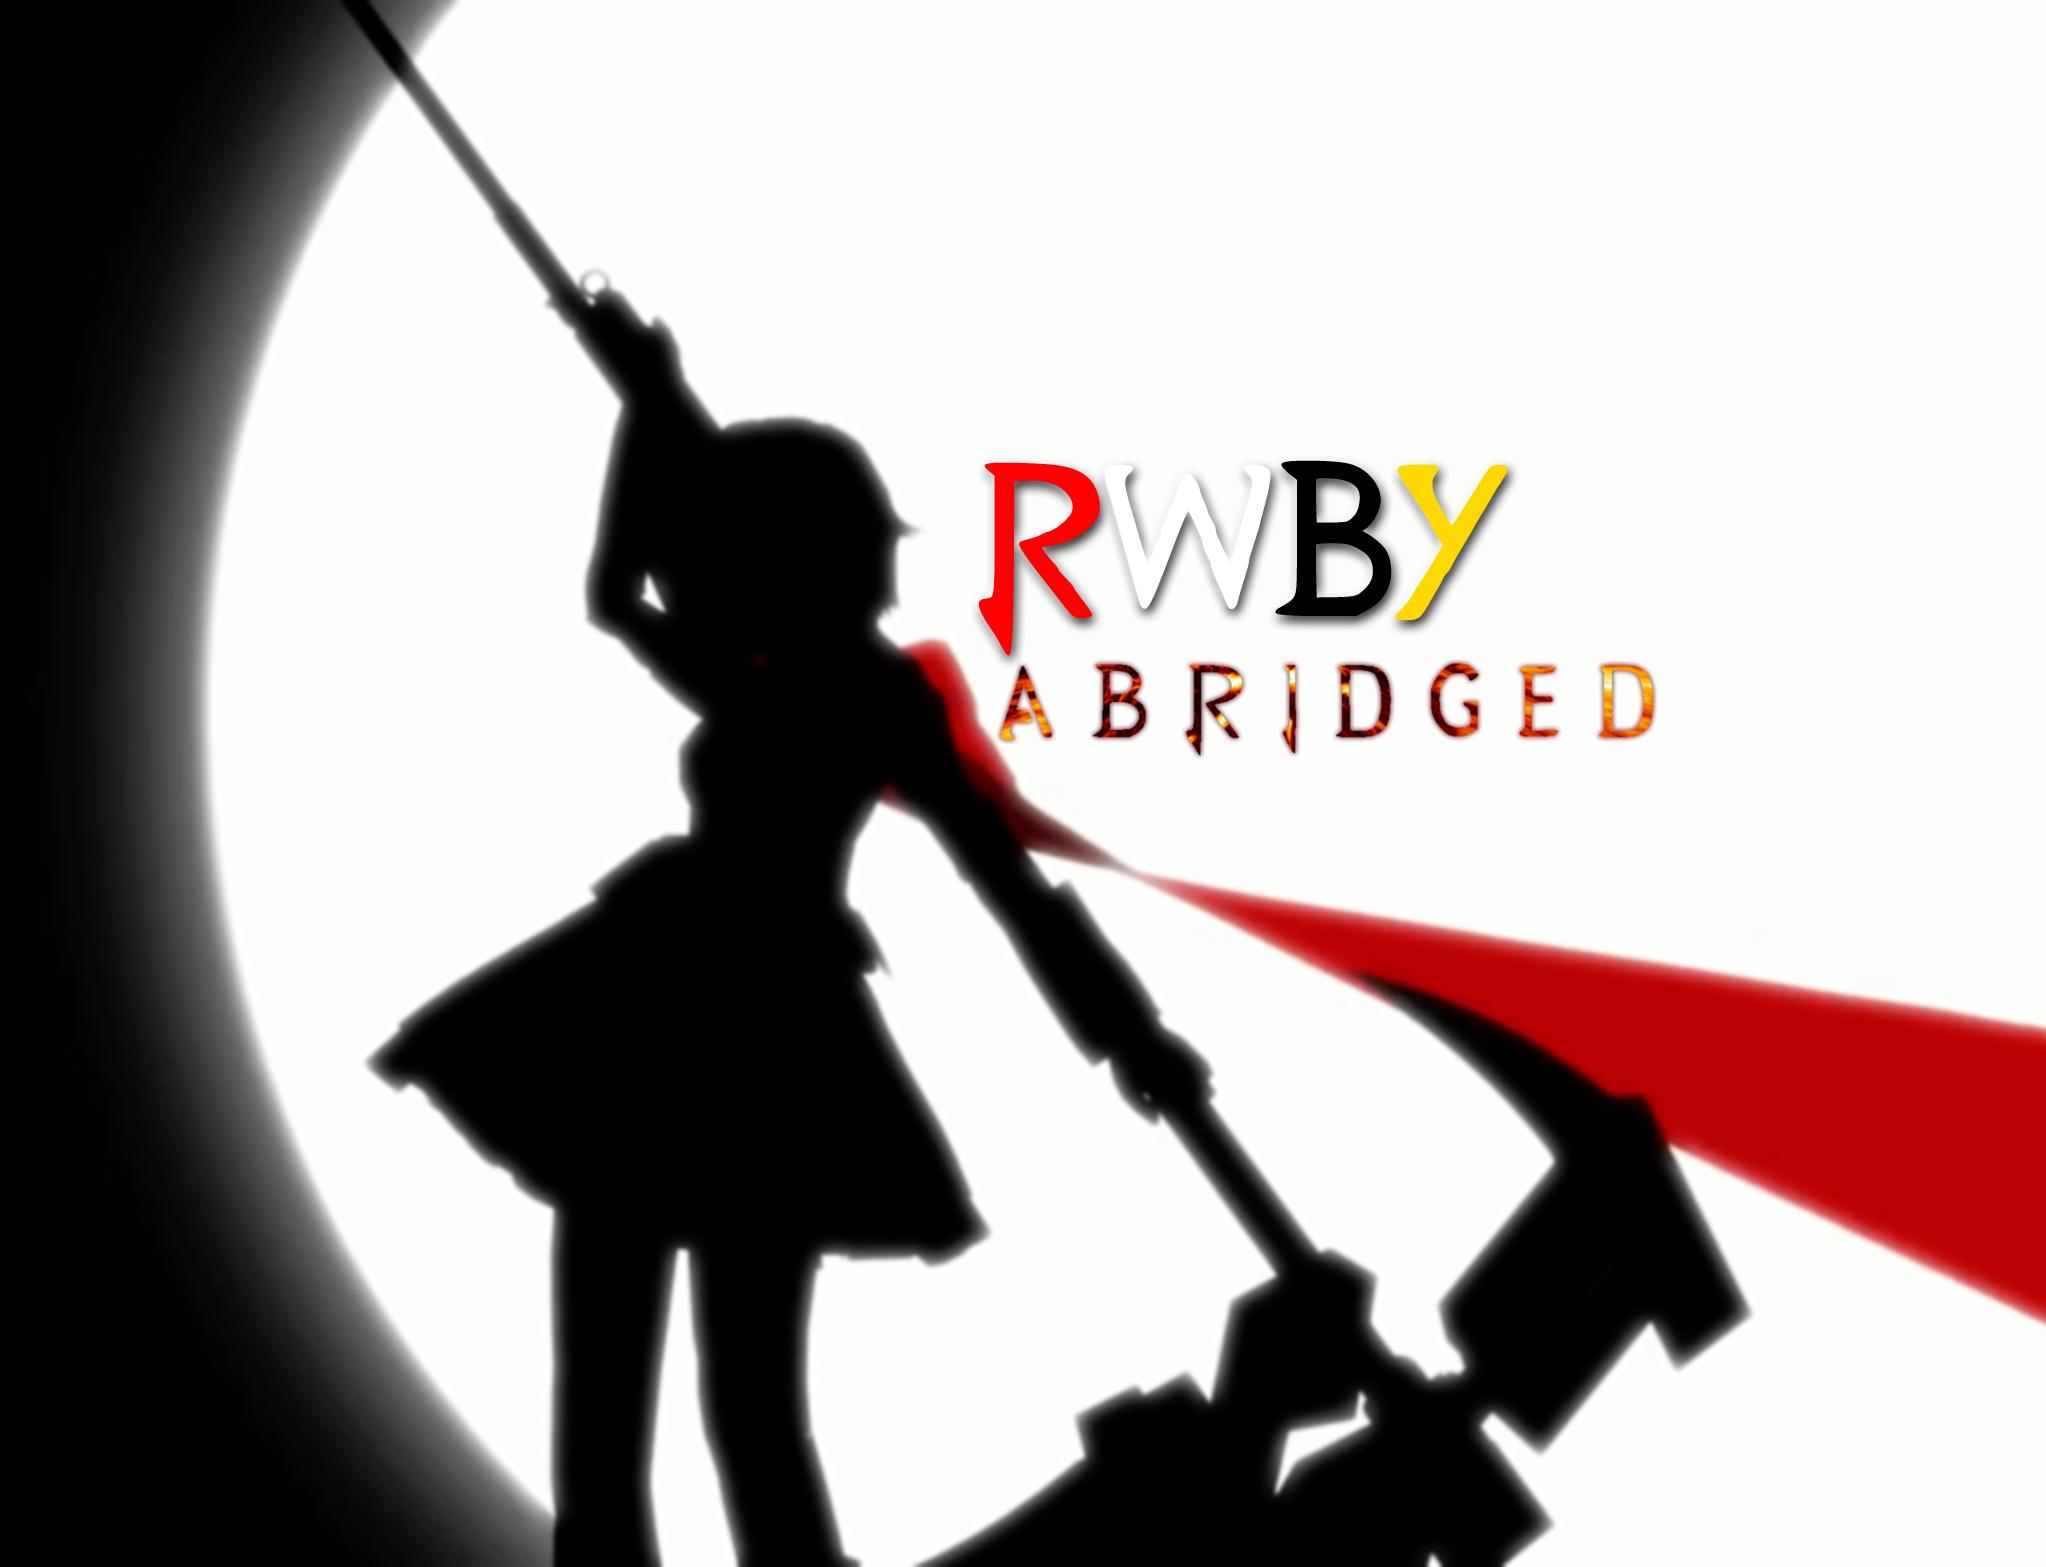 RWBY: The Abridged Series (Web Video) - TV Tropes